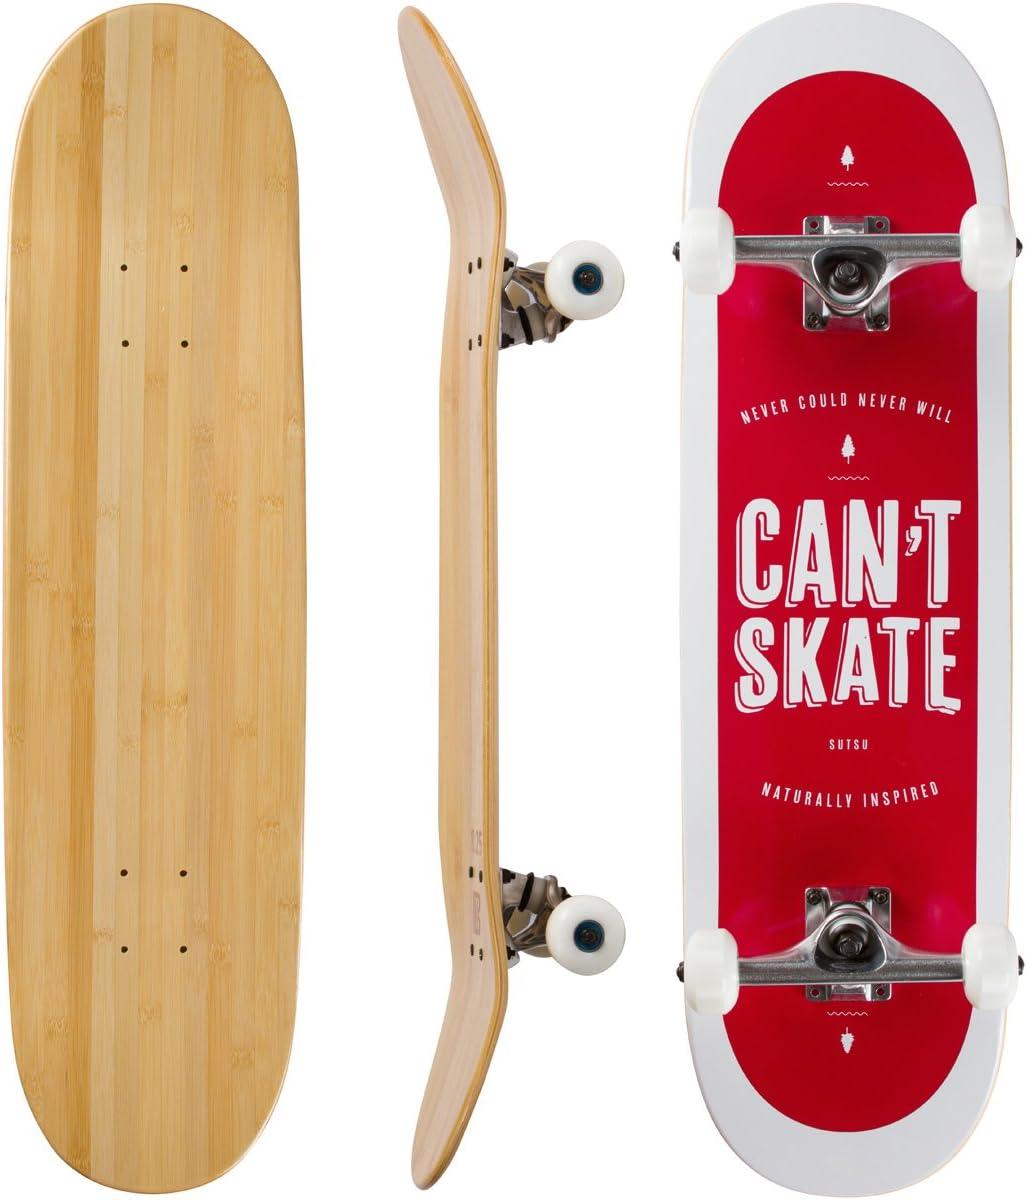 Bamboo Skateboards Complete Easy-to-use Skateboard - More Lighter Stro Oakland Mall Pop